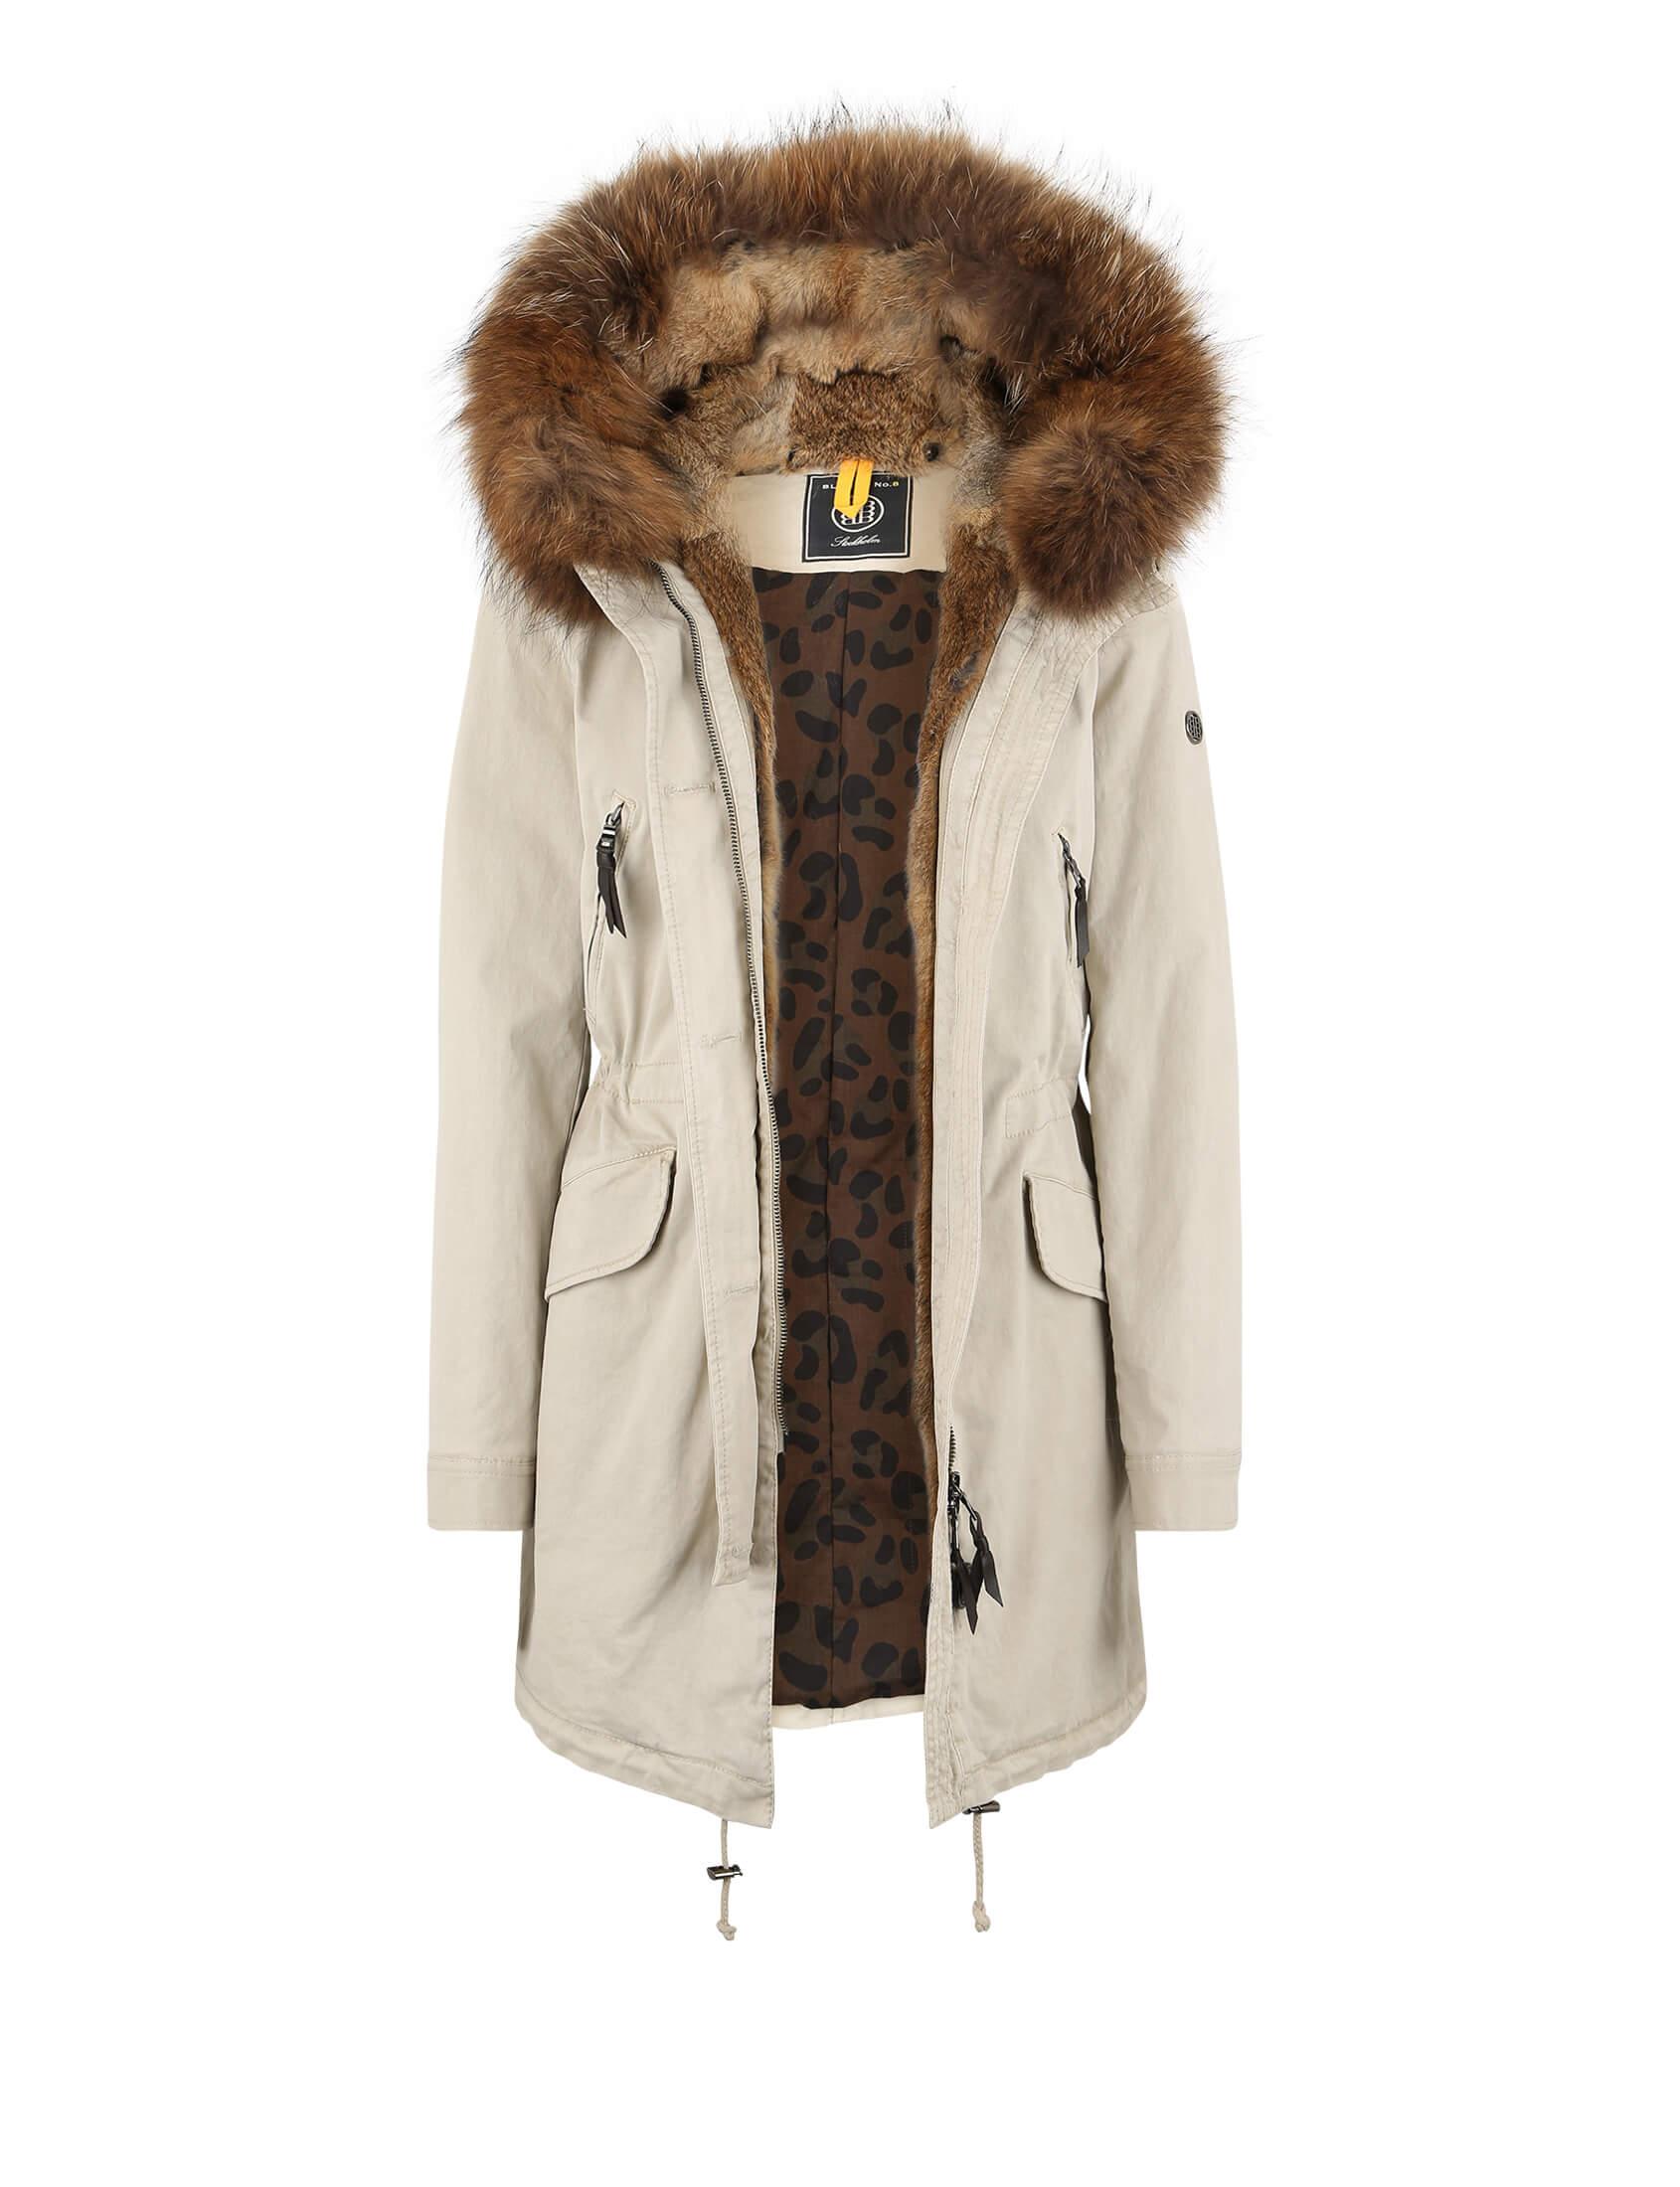 Aspen 515 Real Fur Parka Feather Beige Parka Women